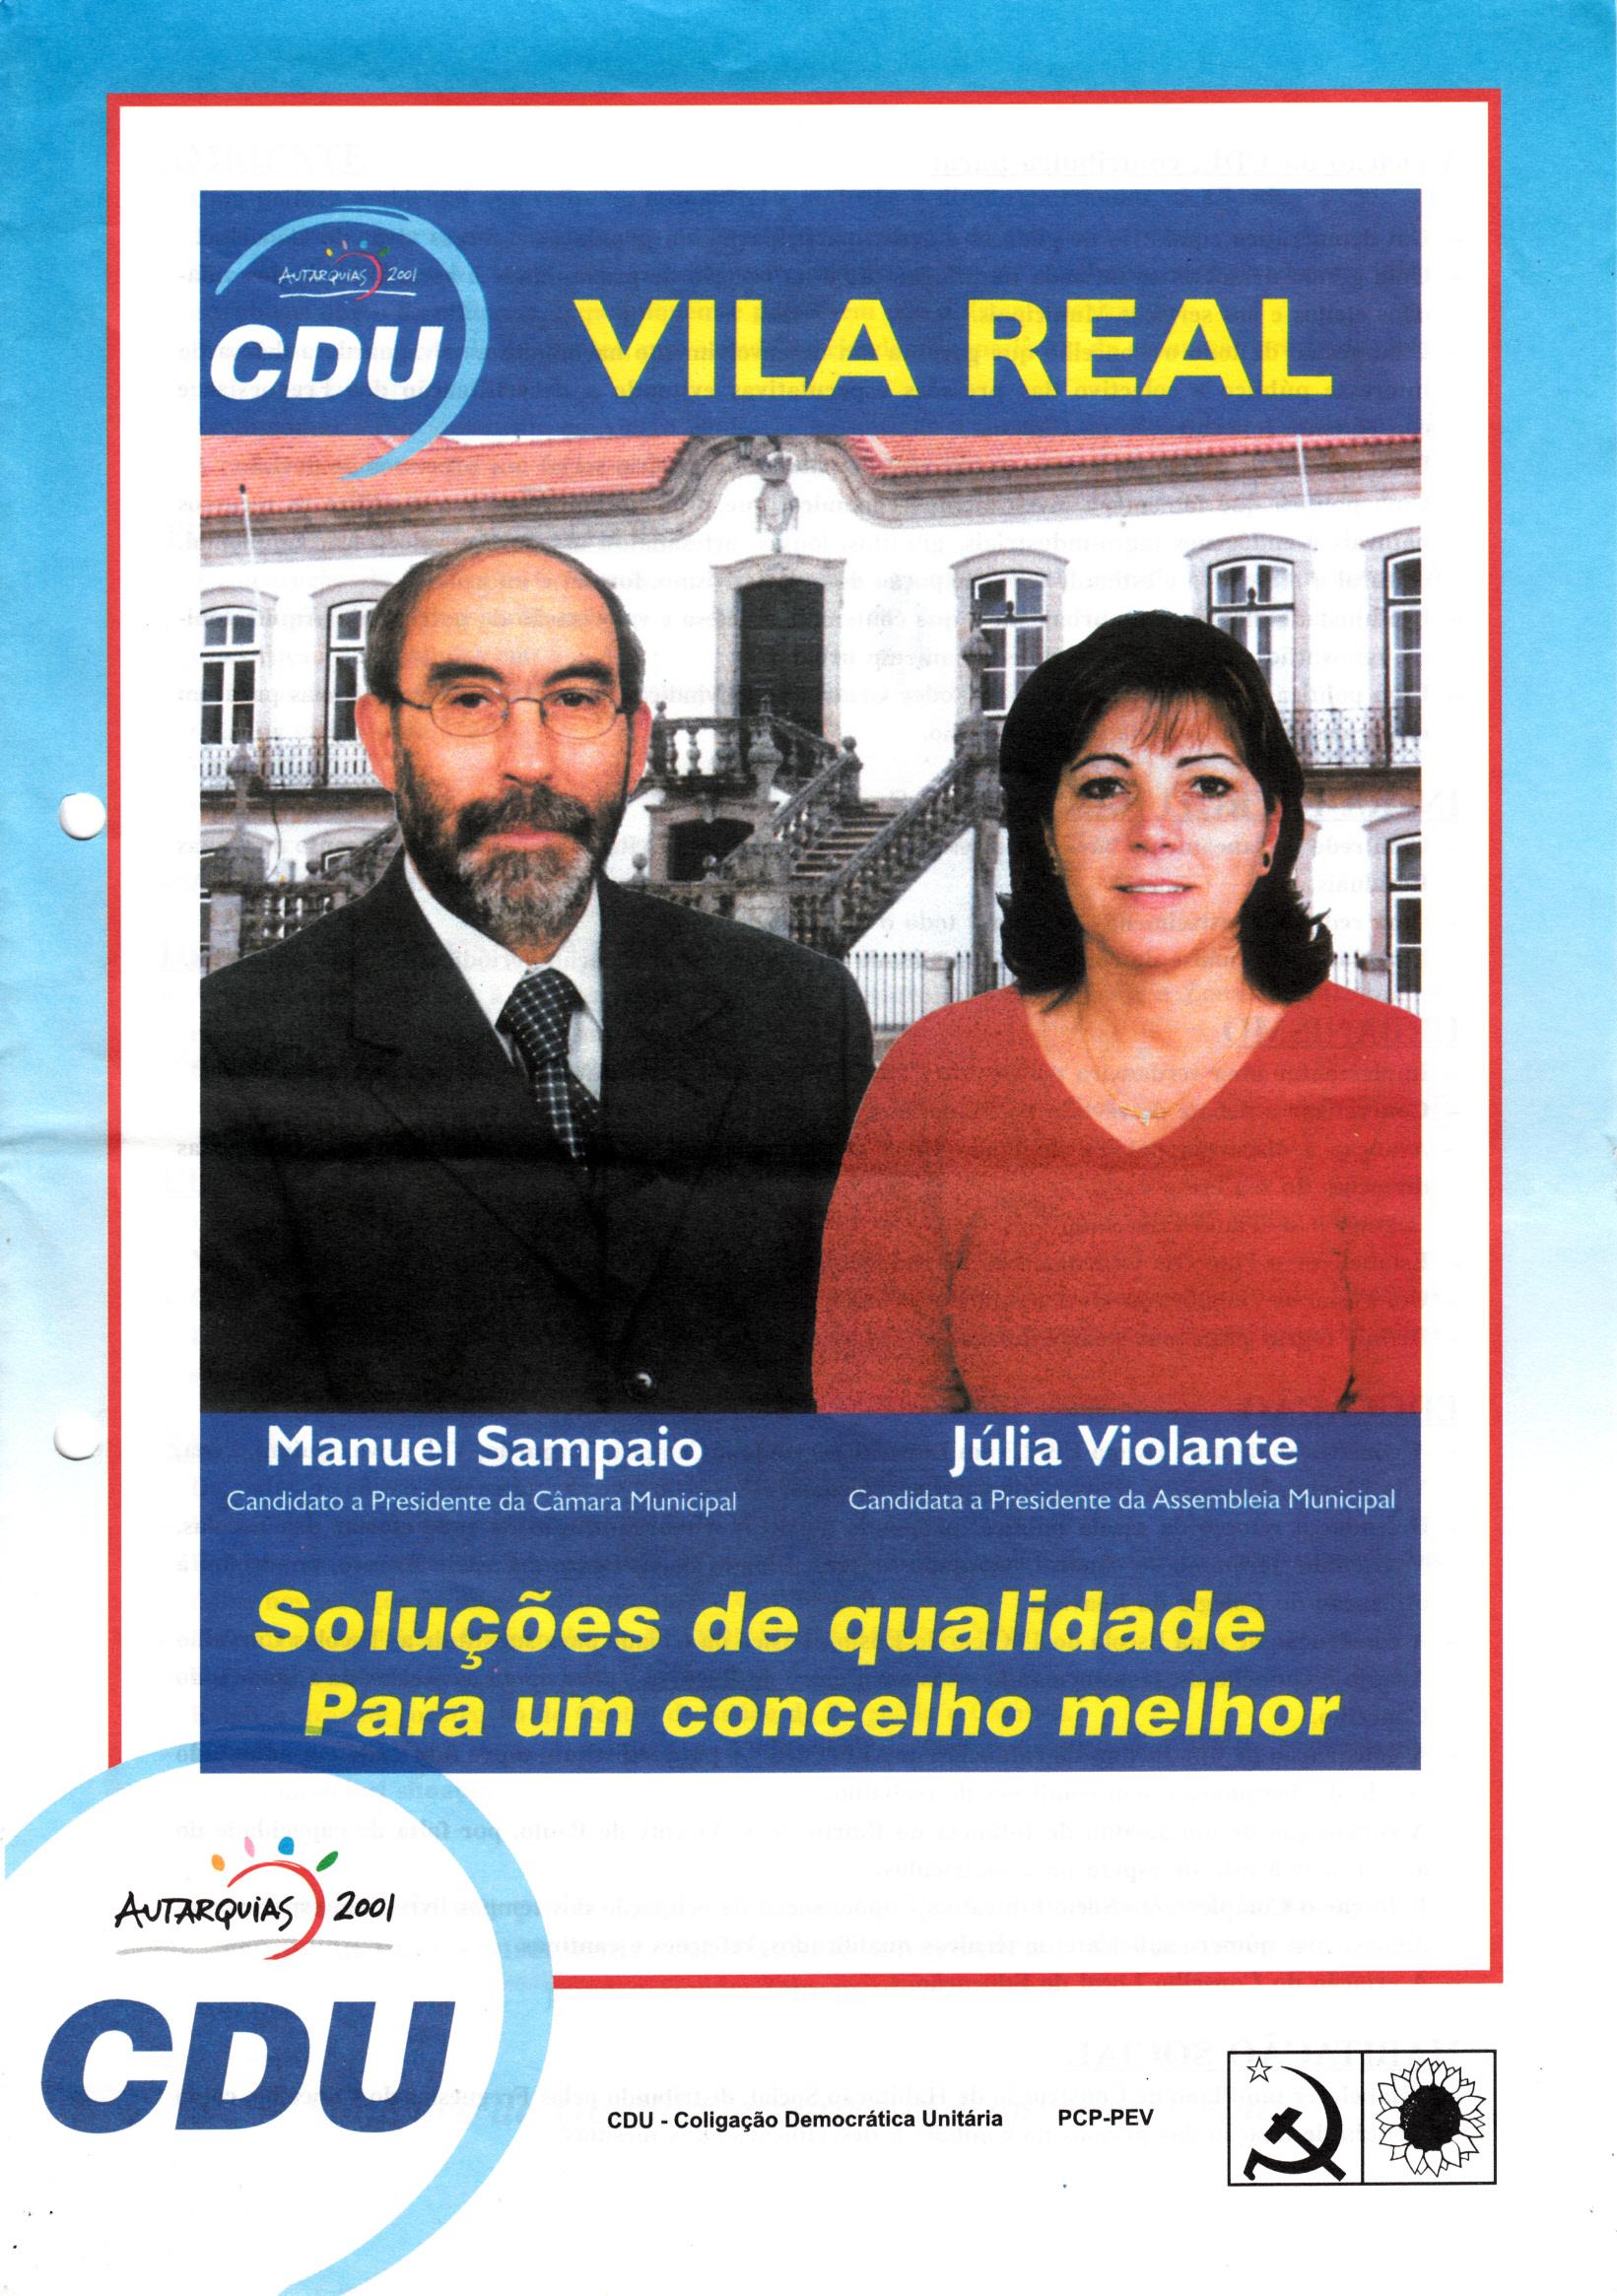 CDU_2001_VILA REAL